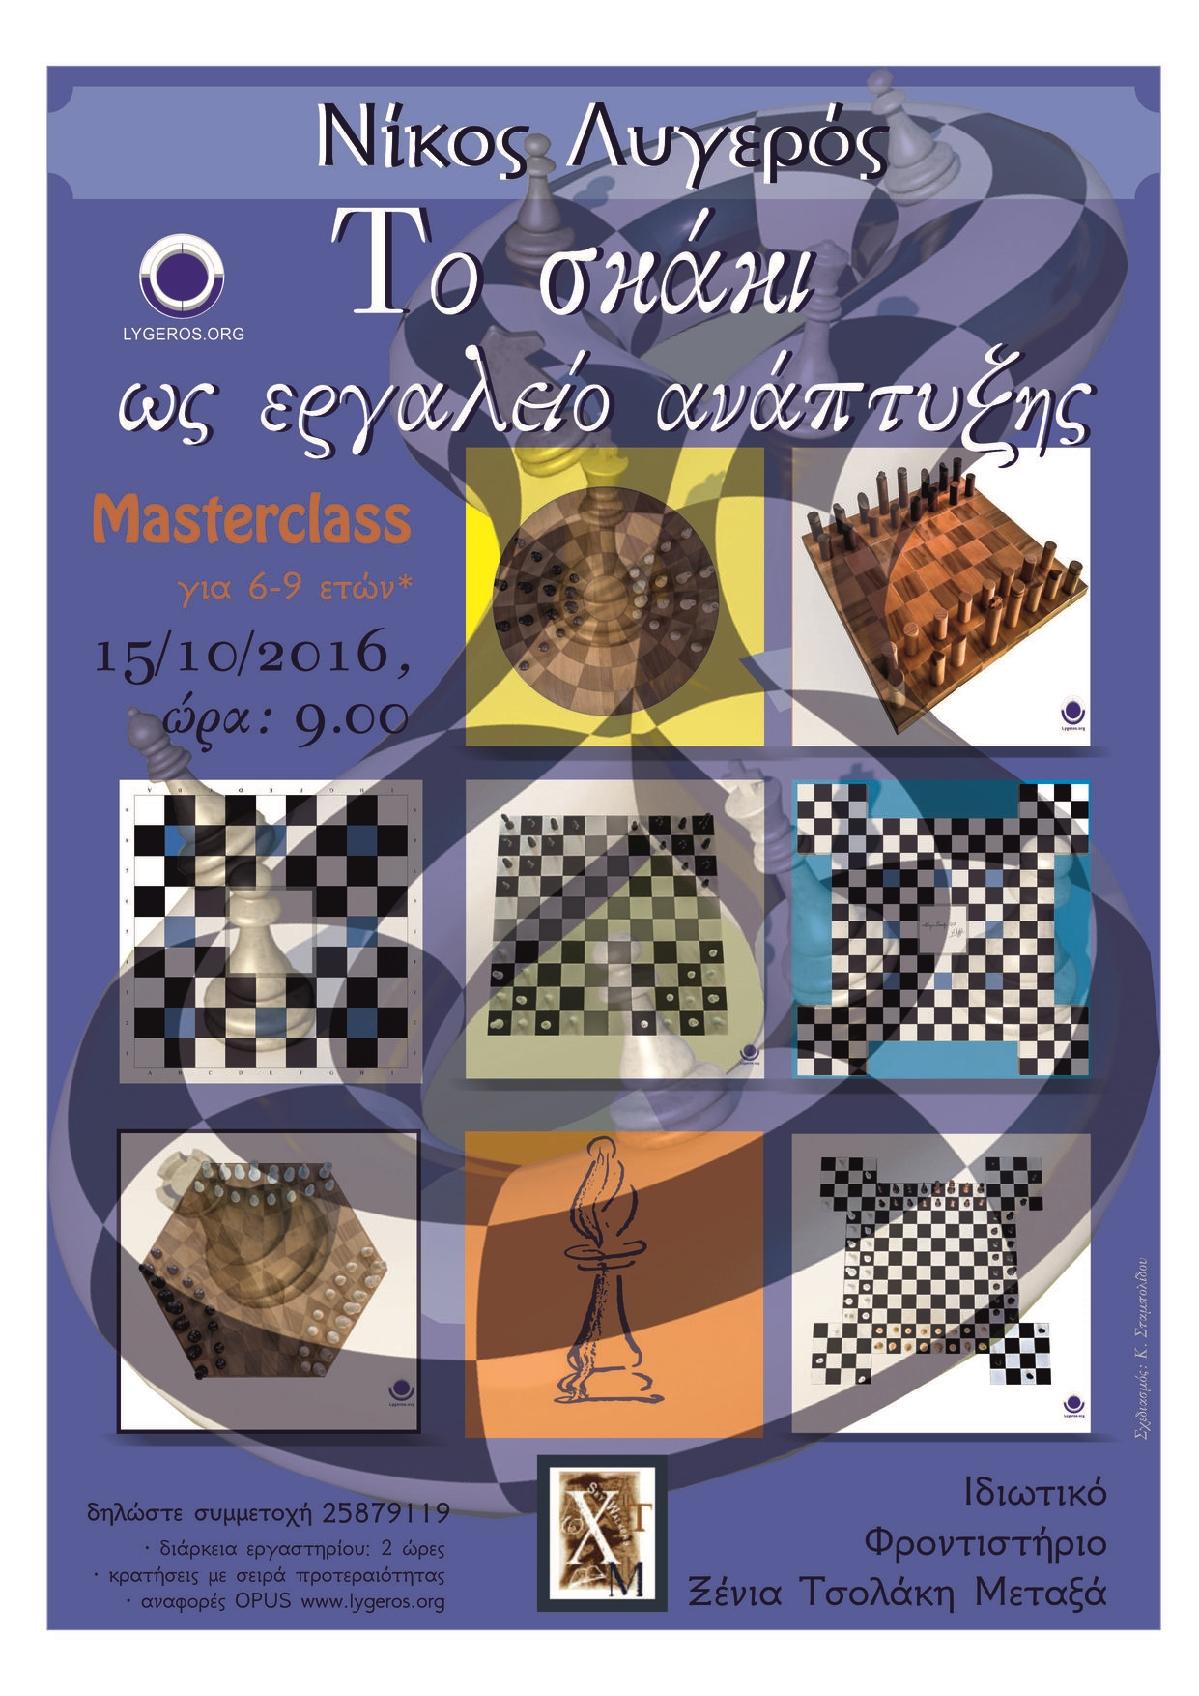 Masterclass: Το σκάκι ως εργαλείο ανάπτυξης